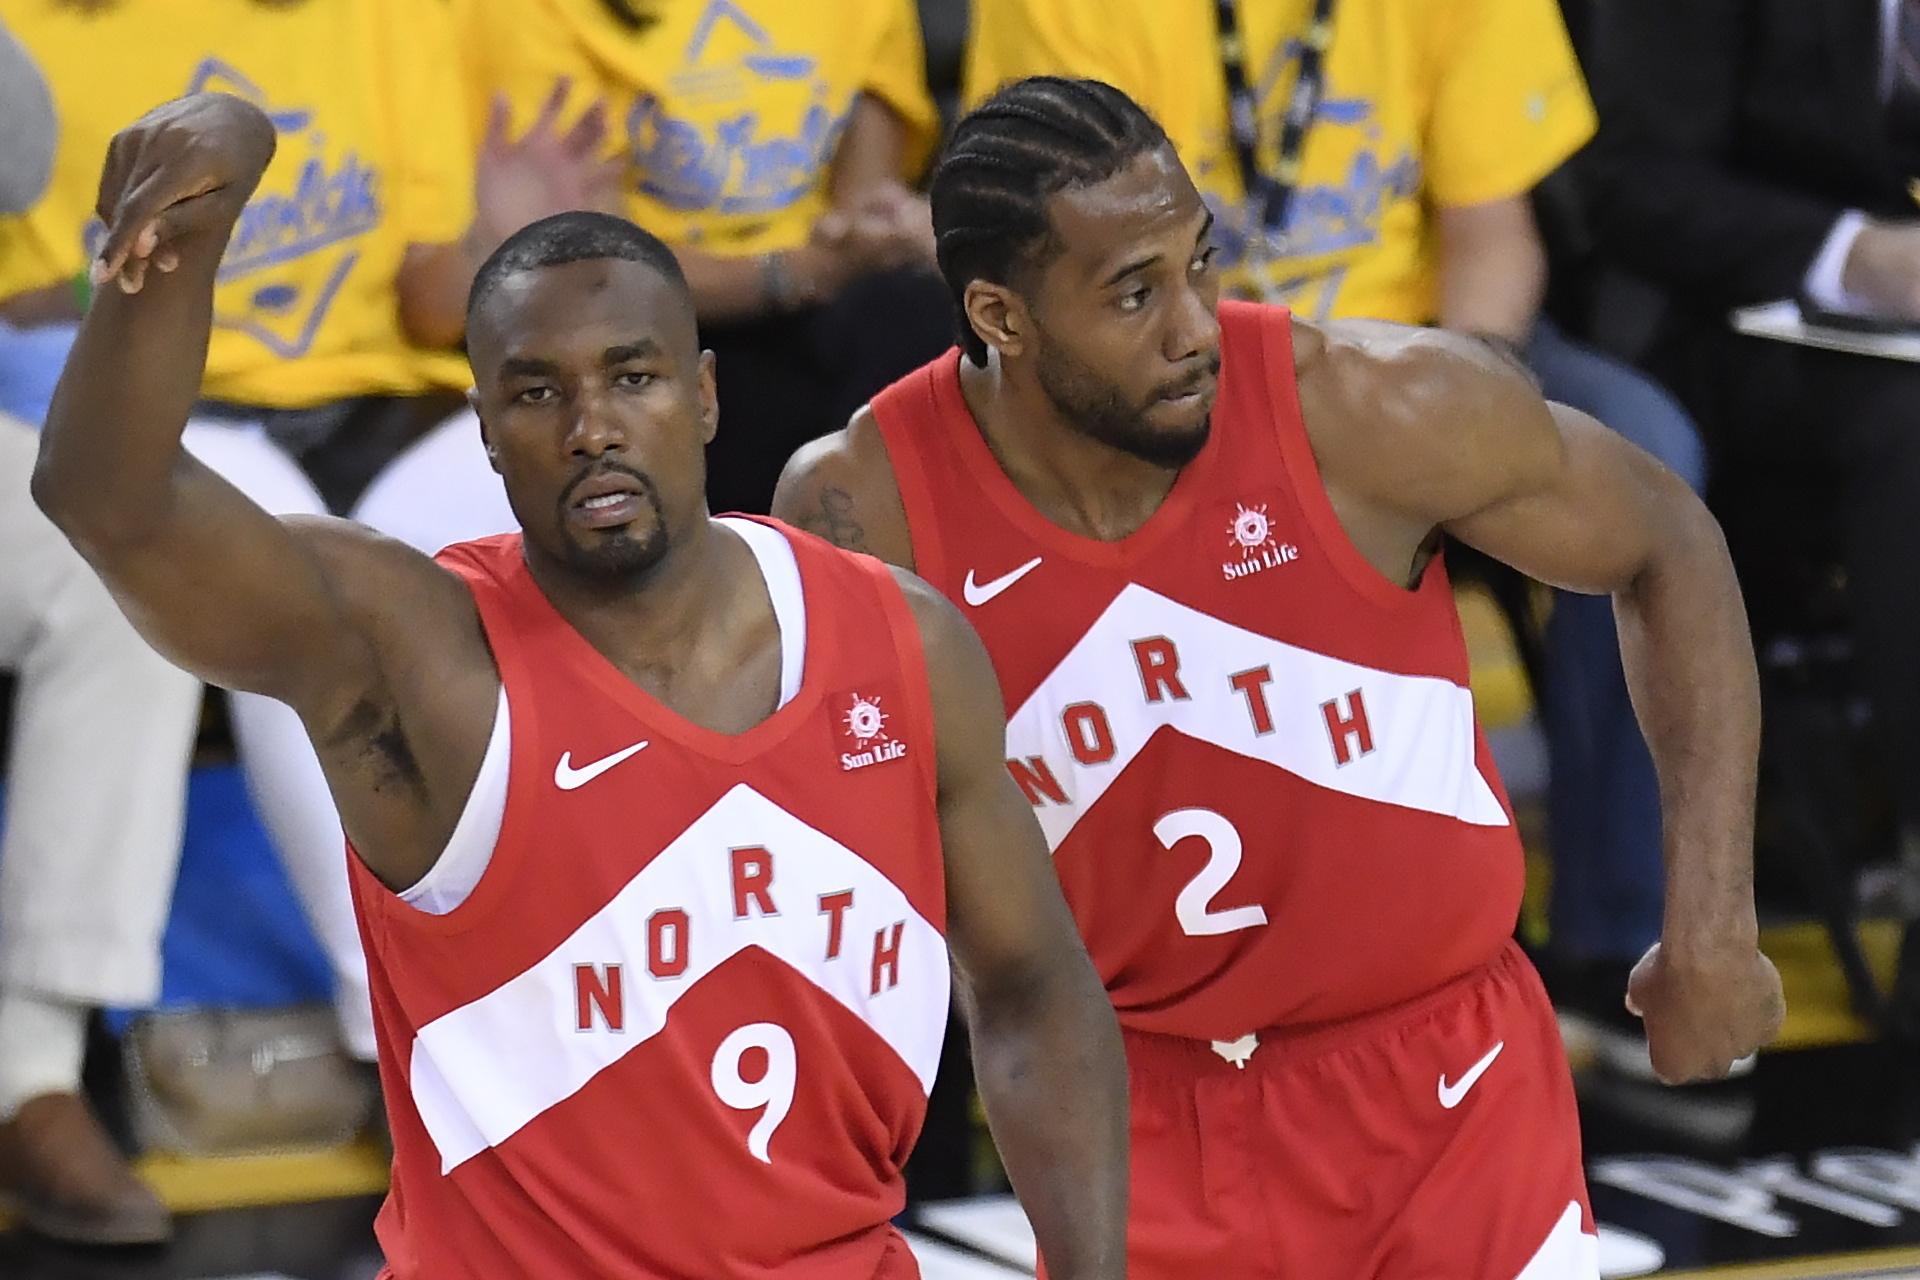 huge selection of 0557a d02c0 With Kawhi Leonard leading way, Raptors on cusp of 1st NBA ...